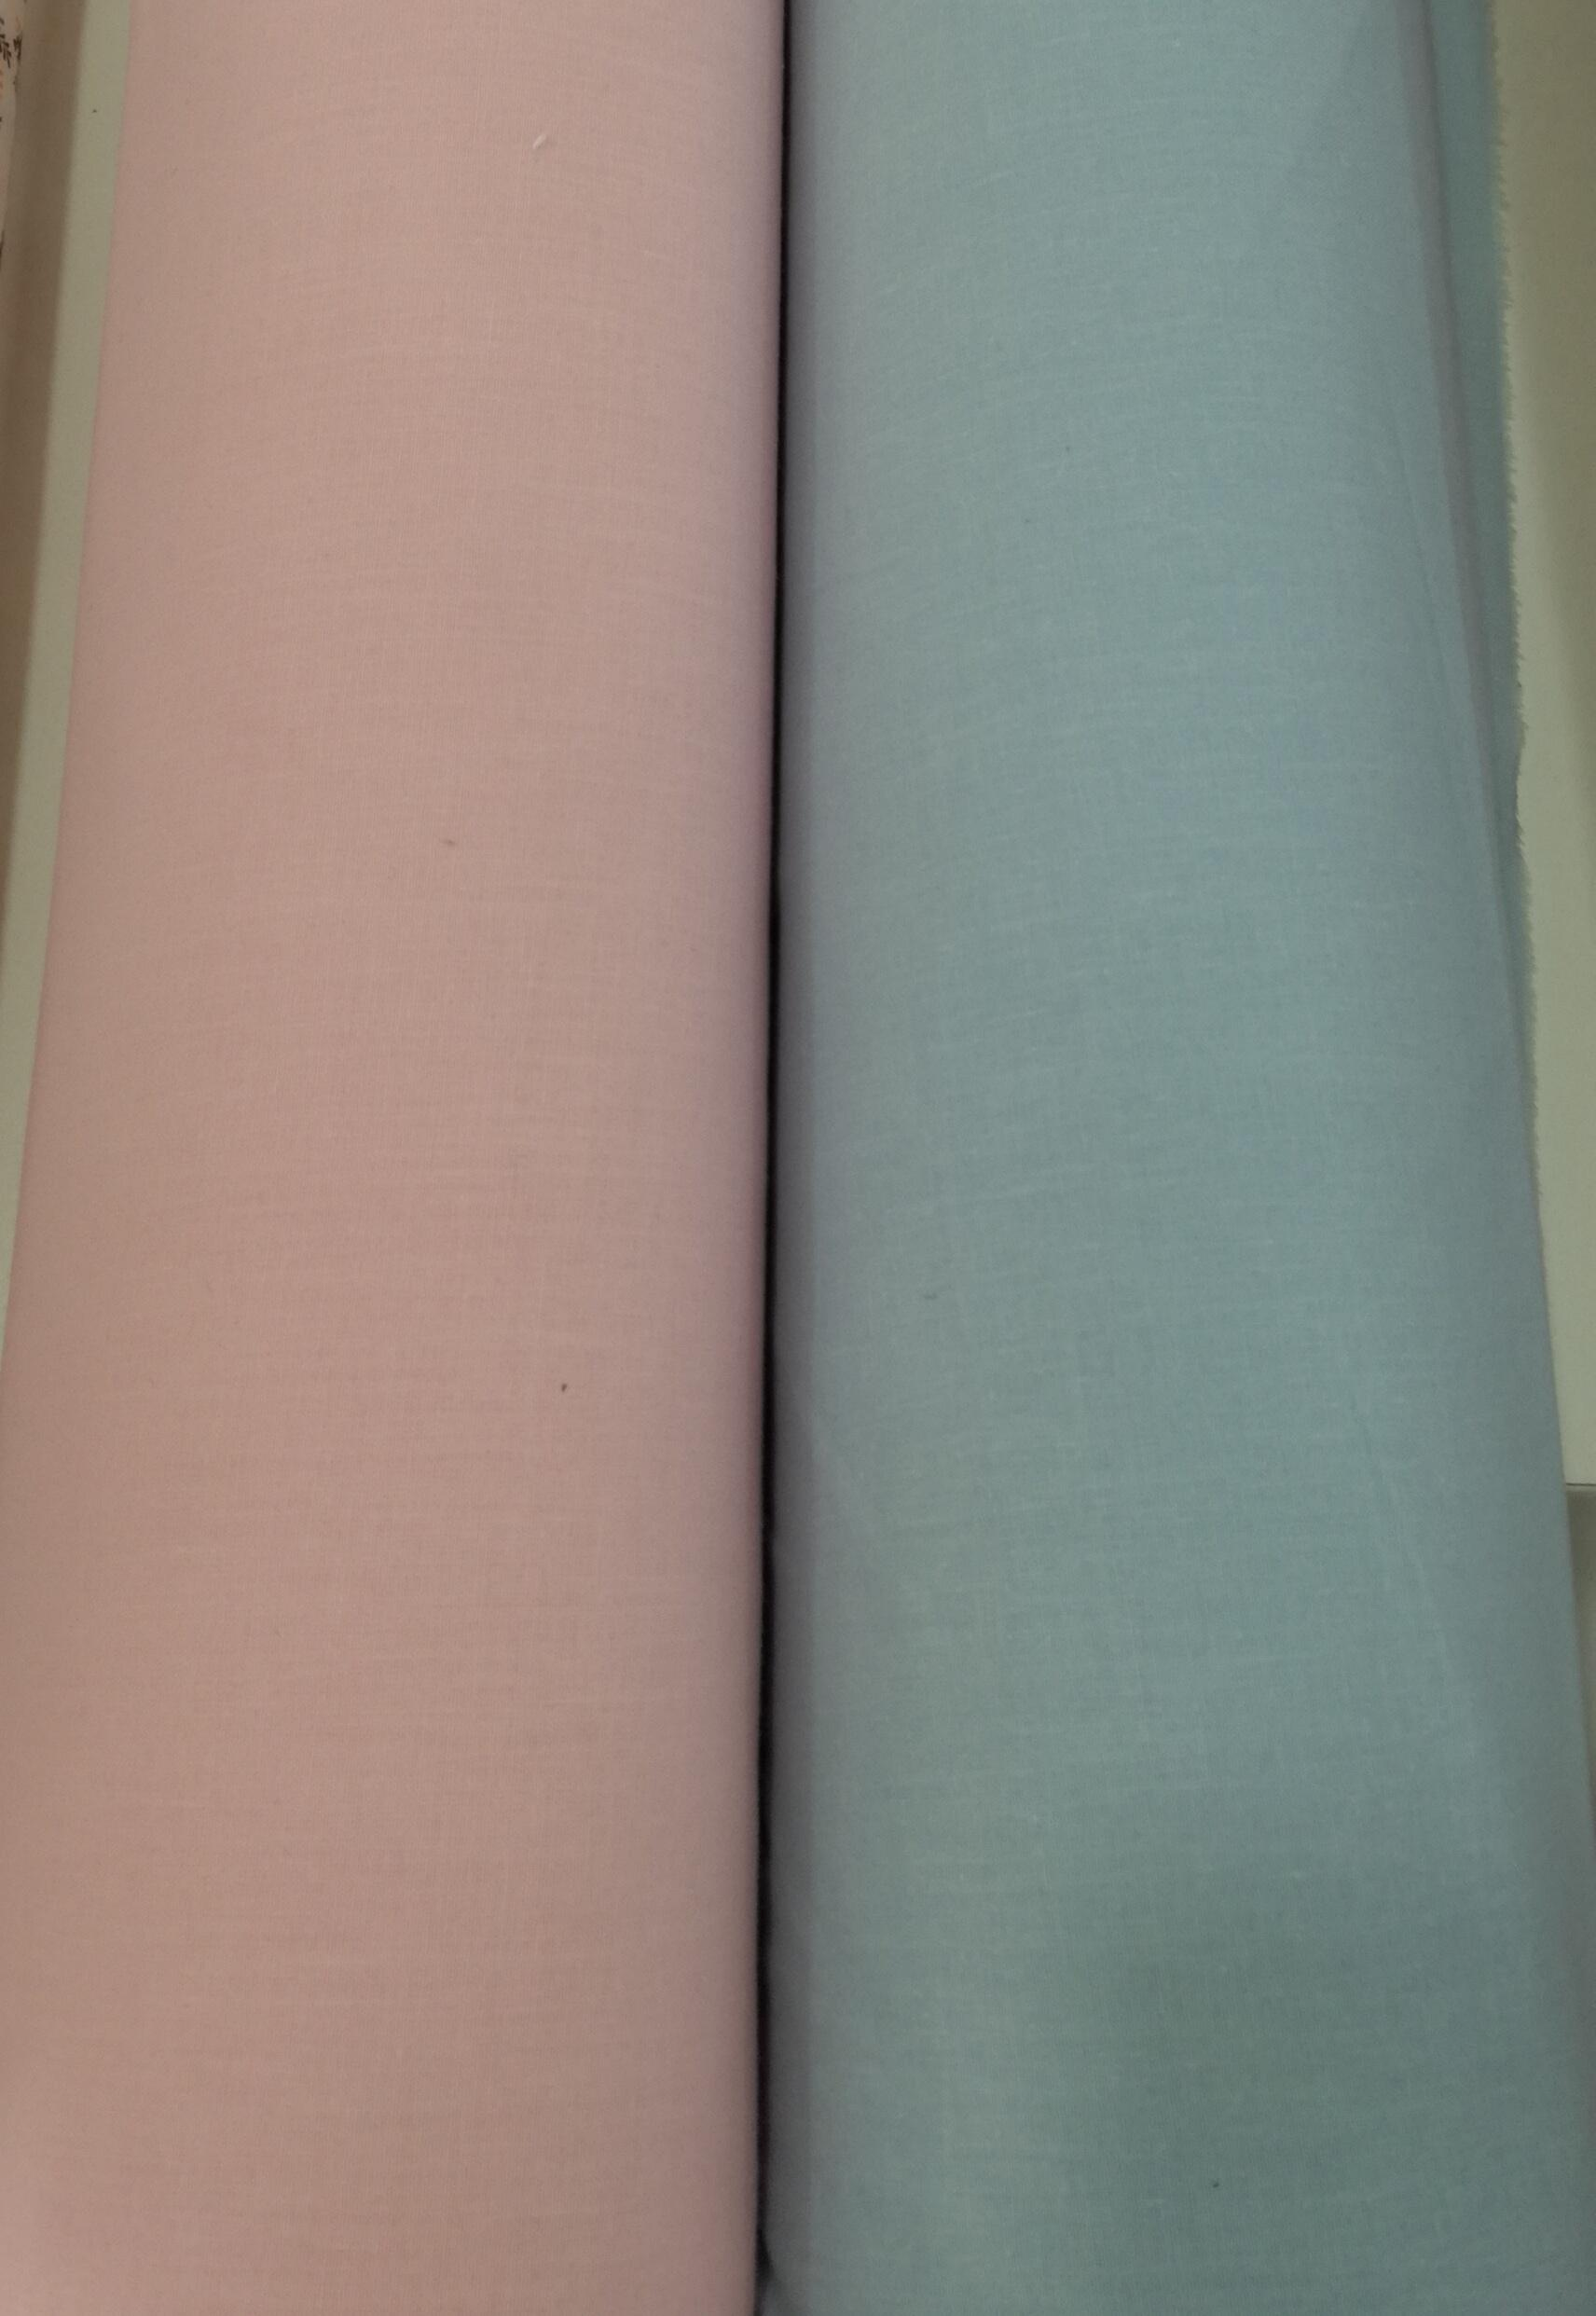 tela lisa algodon 100 color celeste